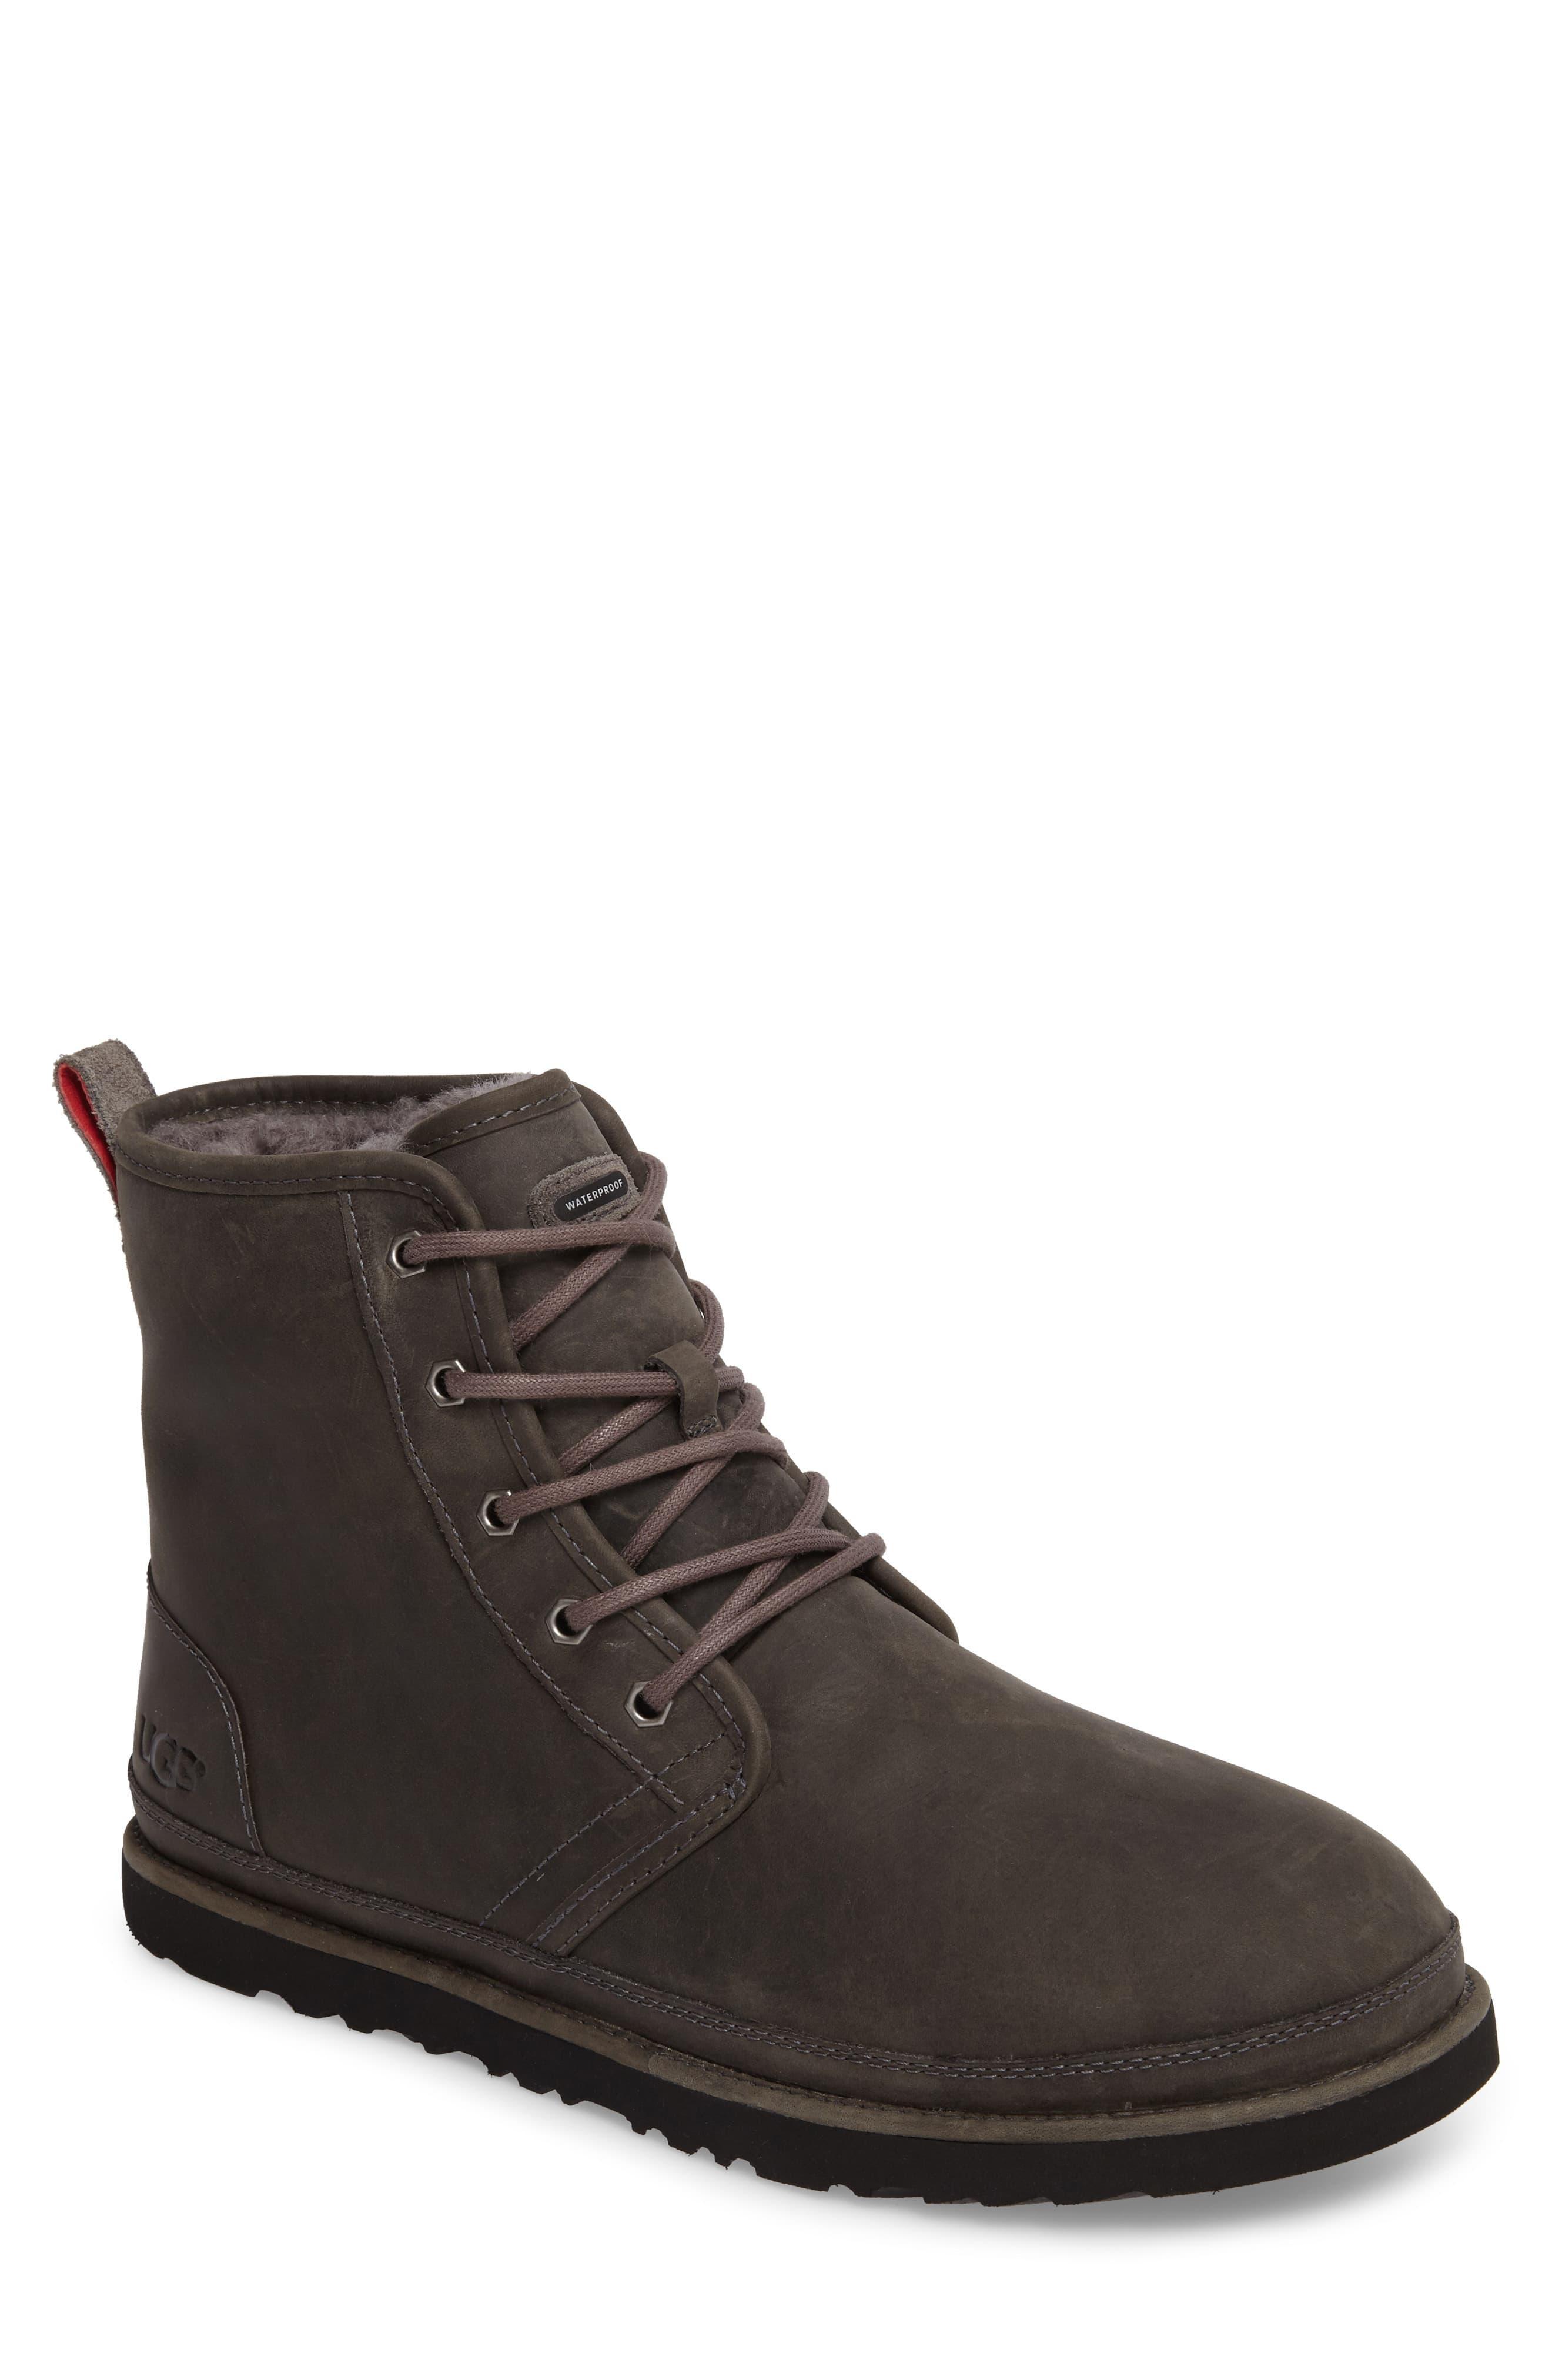 235790daacb Men's Brown Ugg Harkley Plain Toe Waterproof Boot